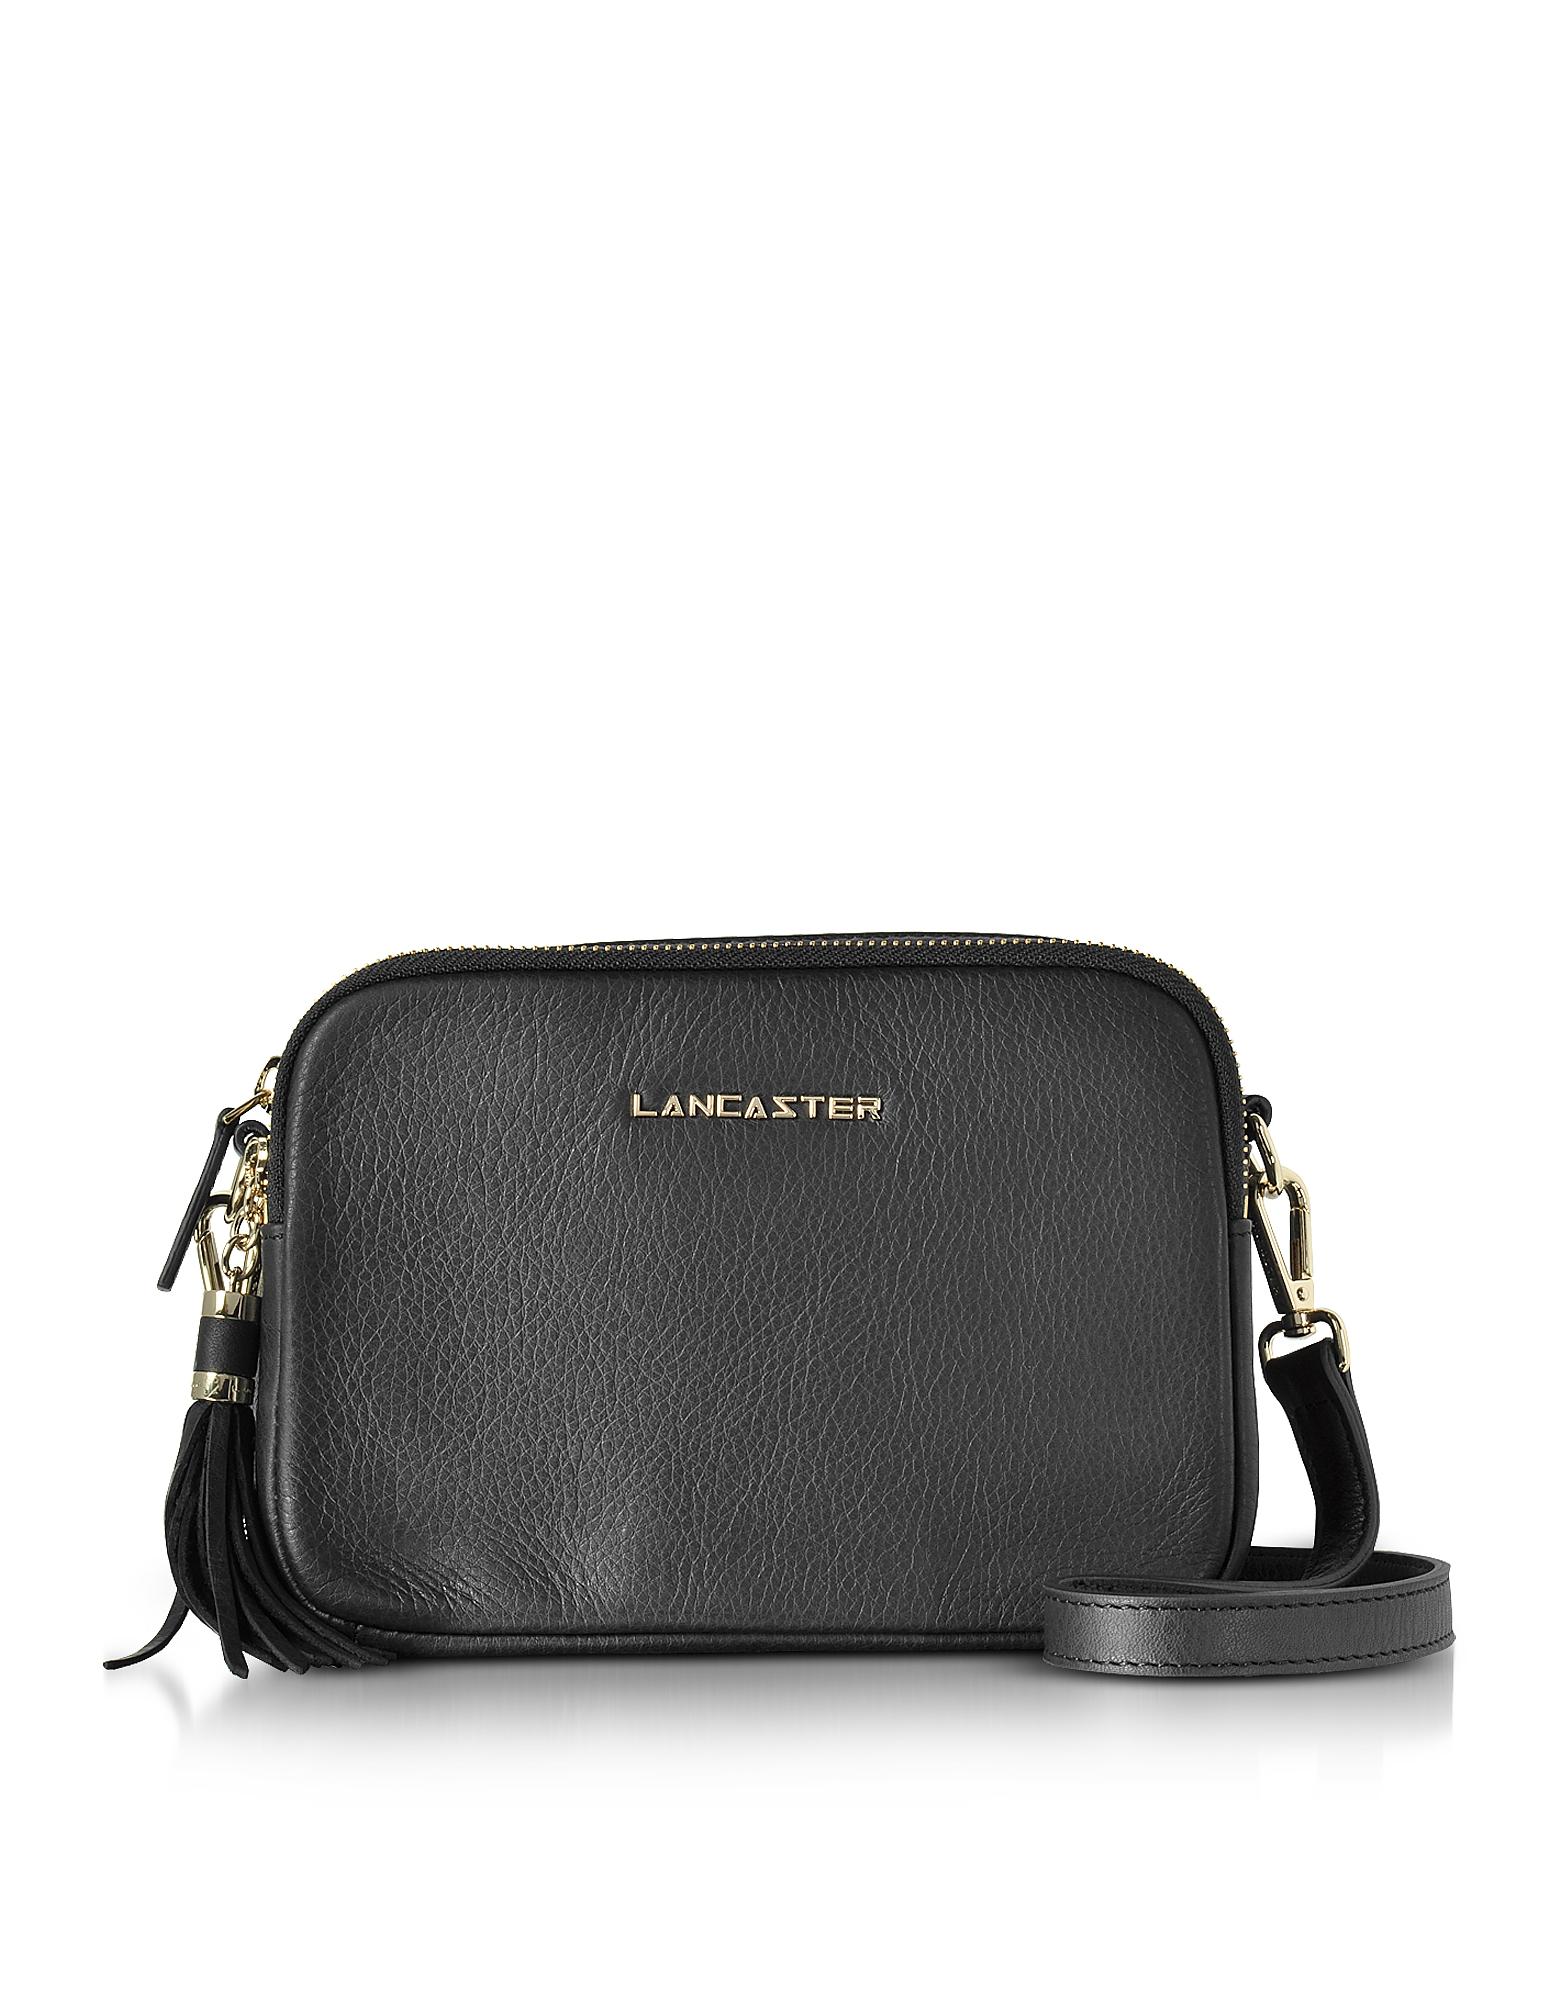 Lancaster Paris Handbags, Mademoiselle Ana Grained Leather Crossbody Bag